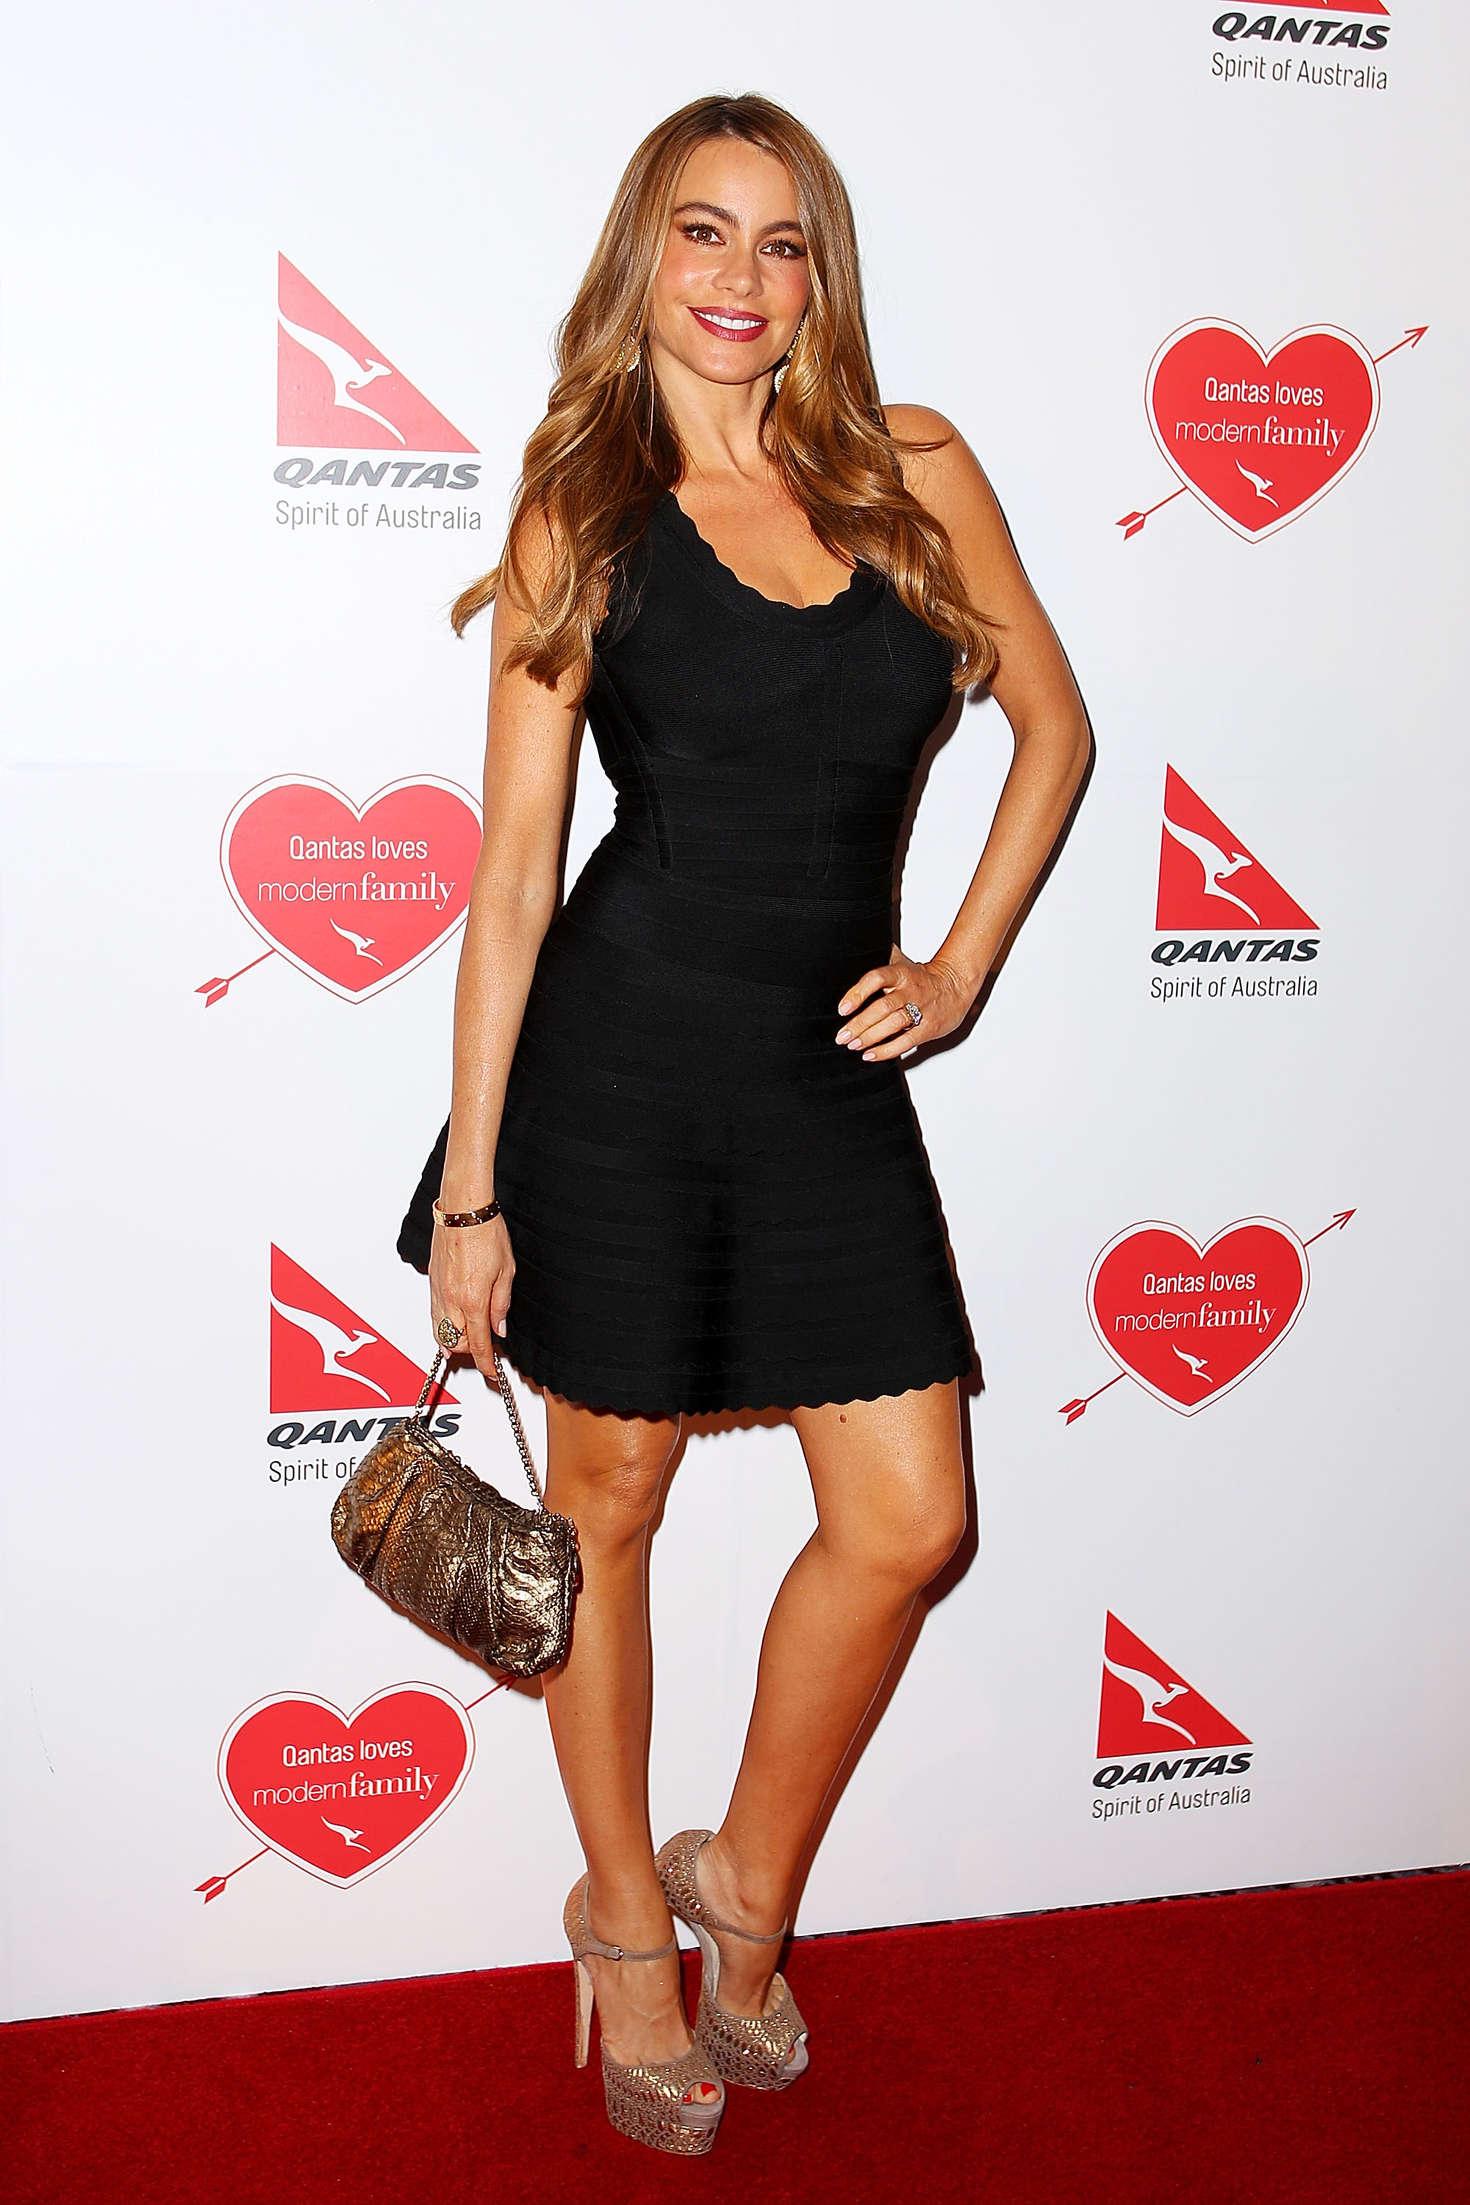 Sofia Vergara at the Qantas party in Sydney -01 - GotCeleb